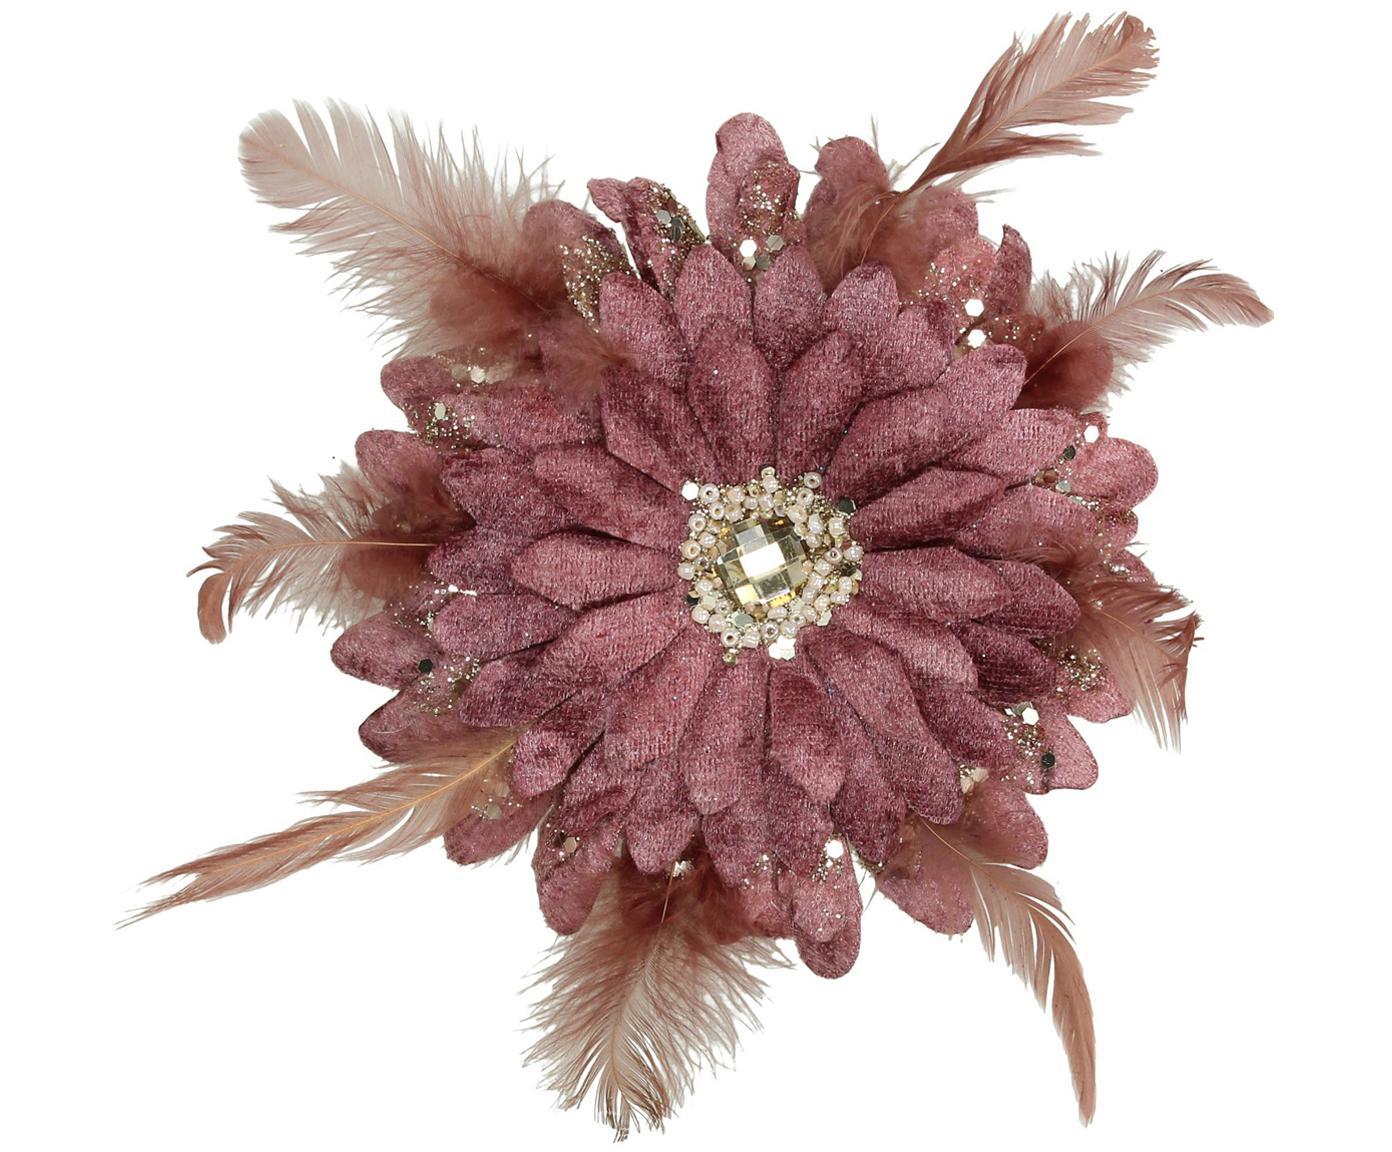 Baumanhänger Flower, Polyester, Kunststoff, Altrosa, Goldfarben, Ø 20 cm